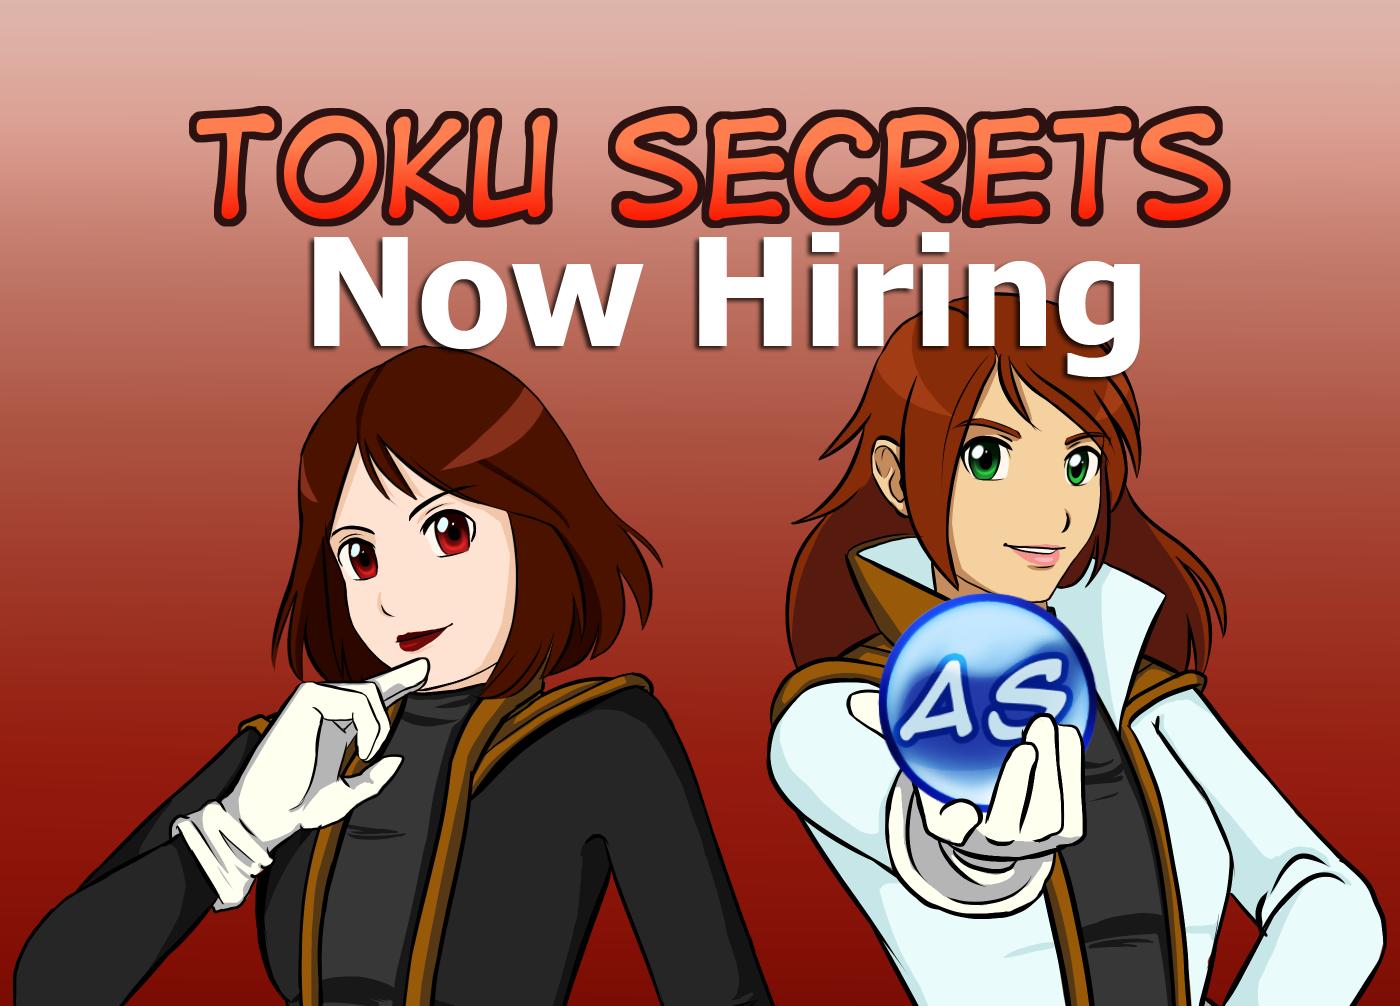 Toku Secrets: Now Hiring